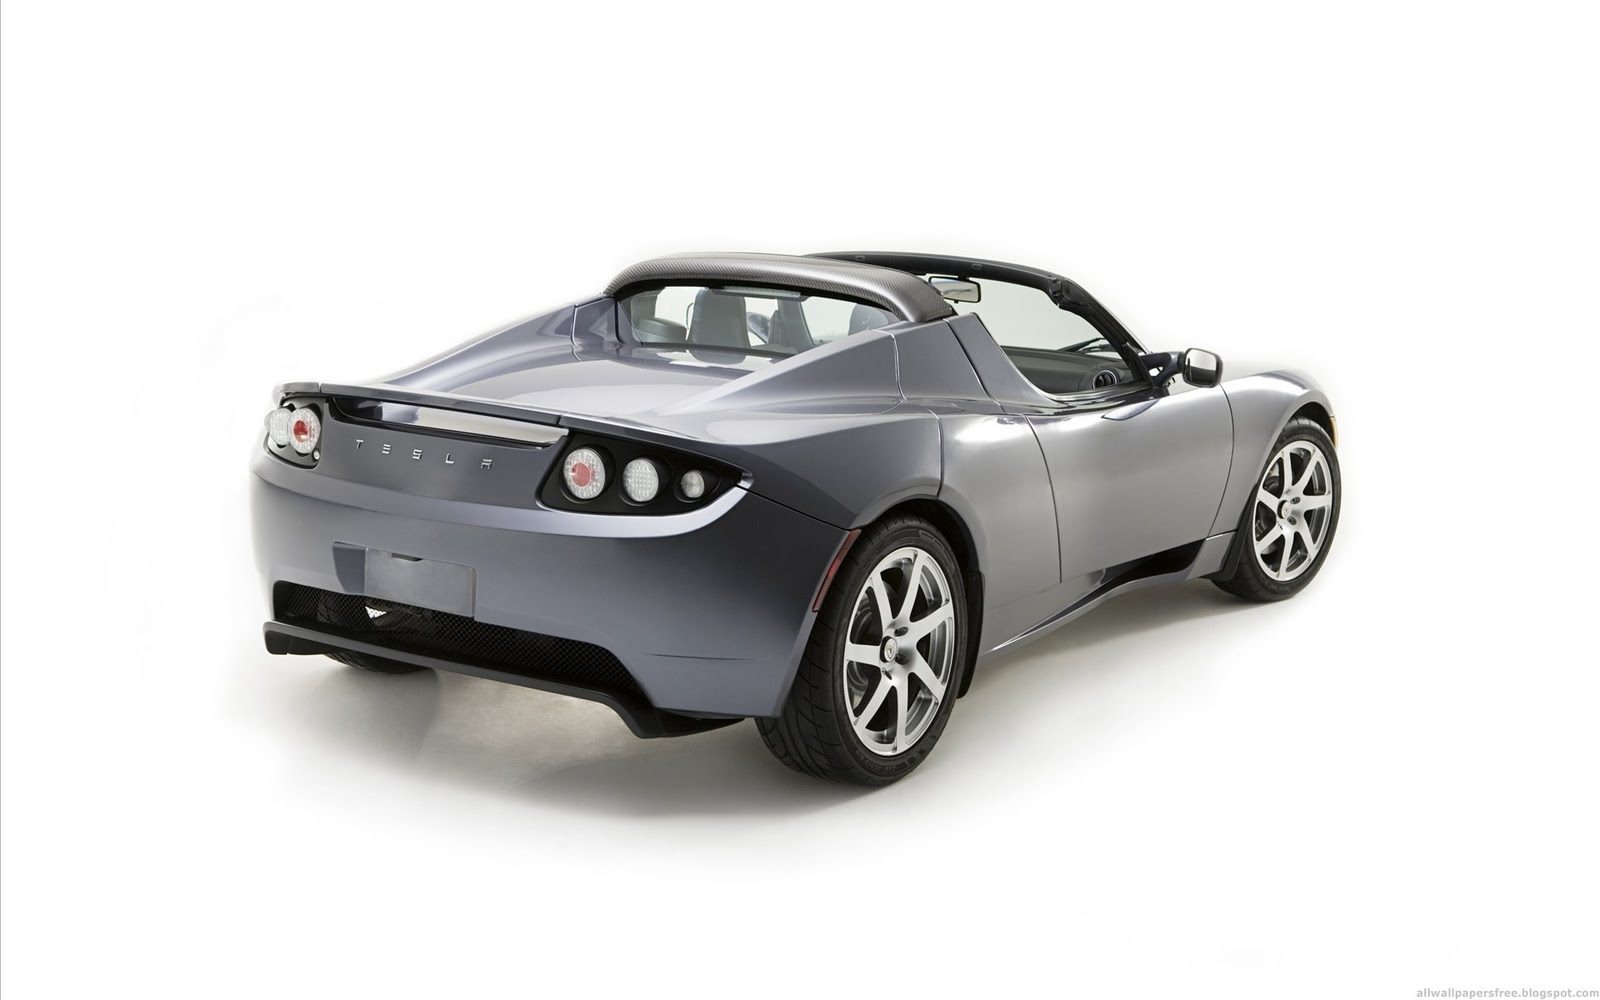 Hot Cars Tesla Motors Roadster Electric Car Maker